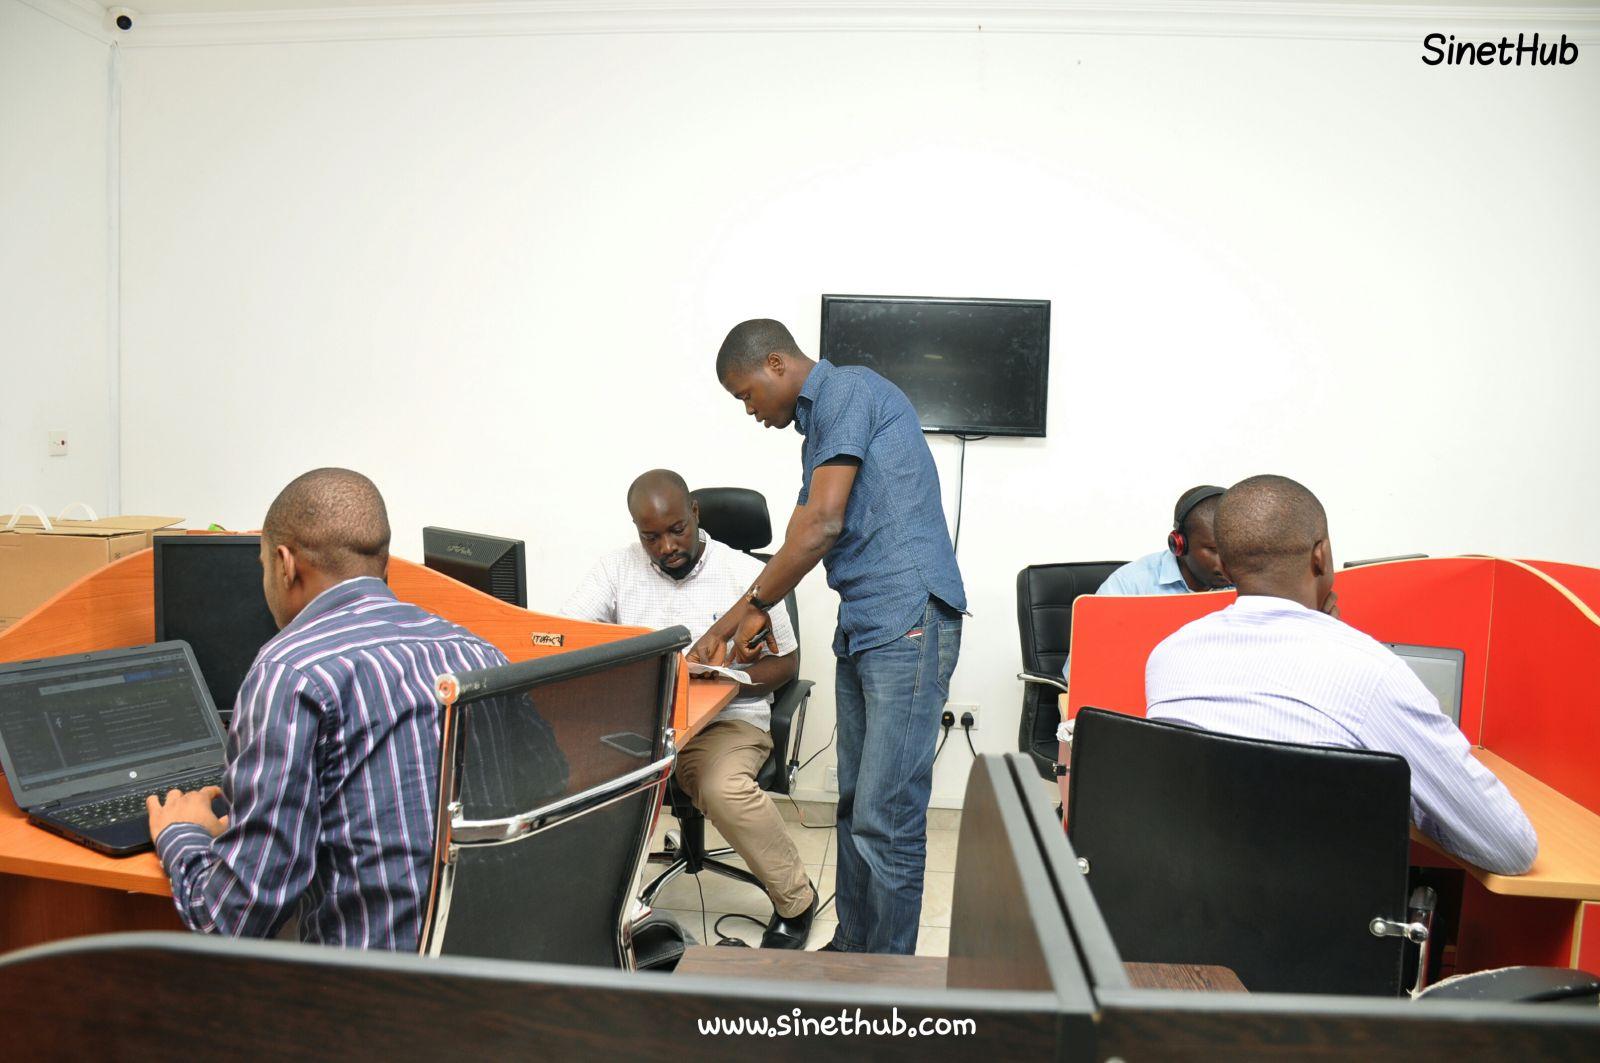 Sinet Hub, Lagos - Read Reviews & Book Online